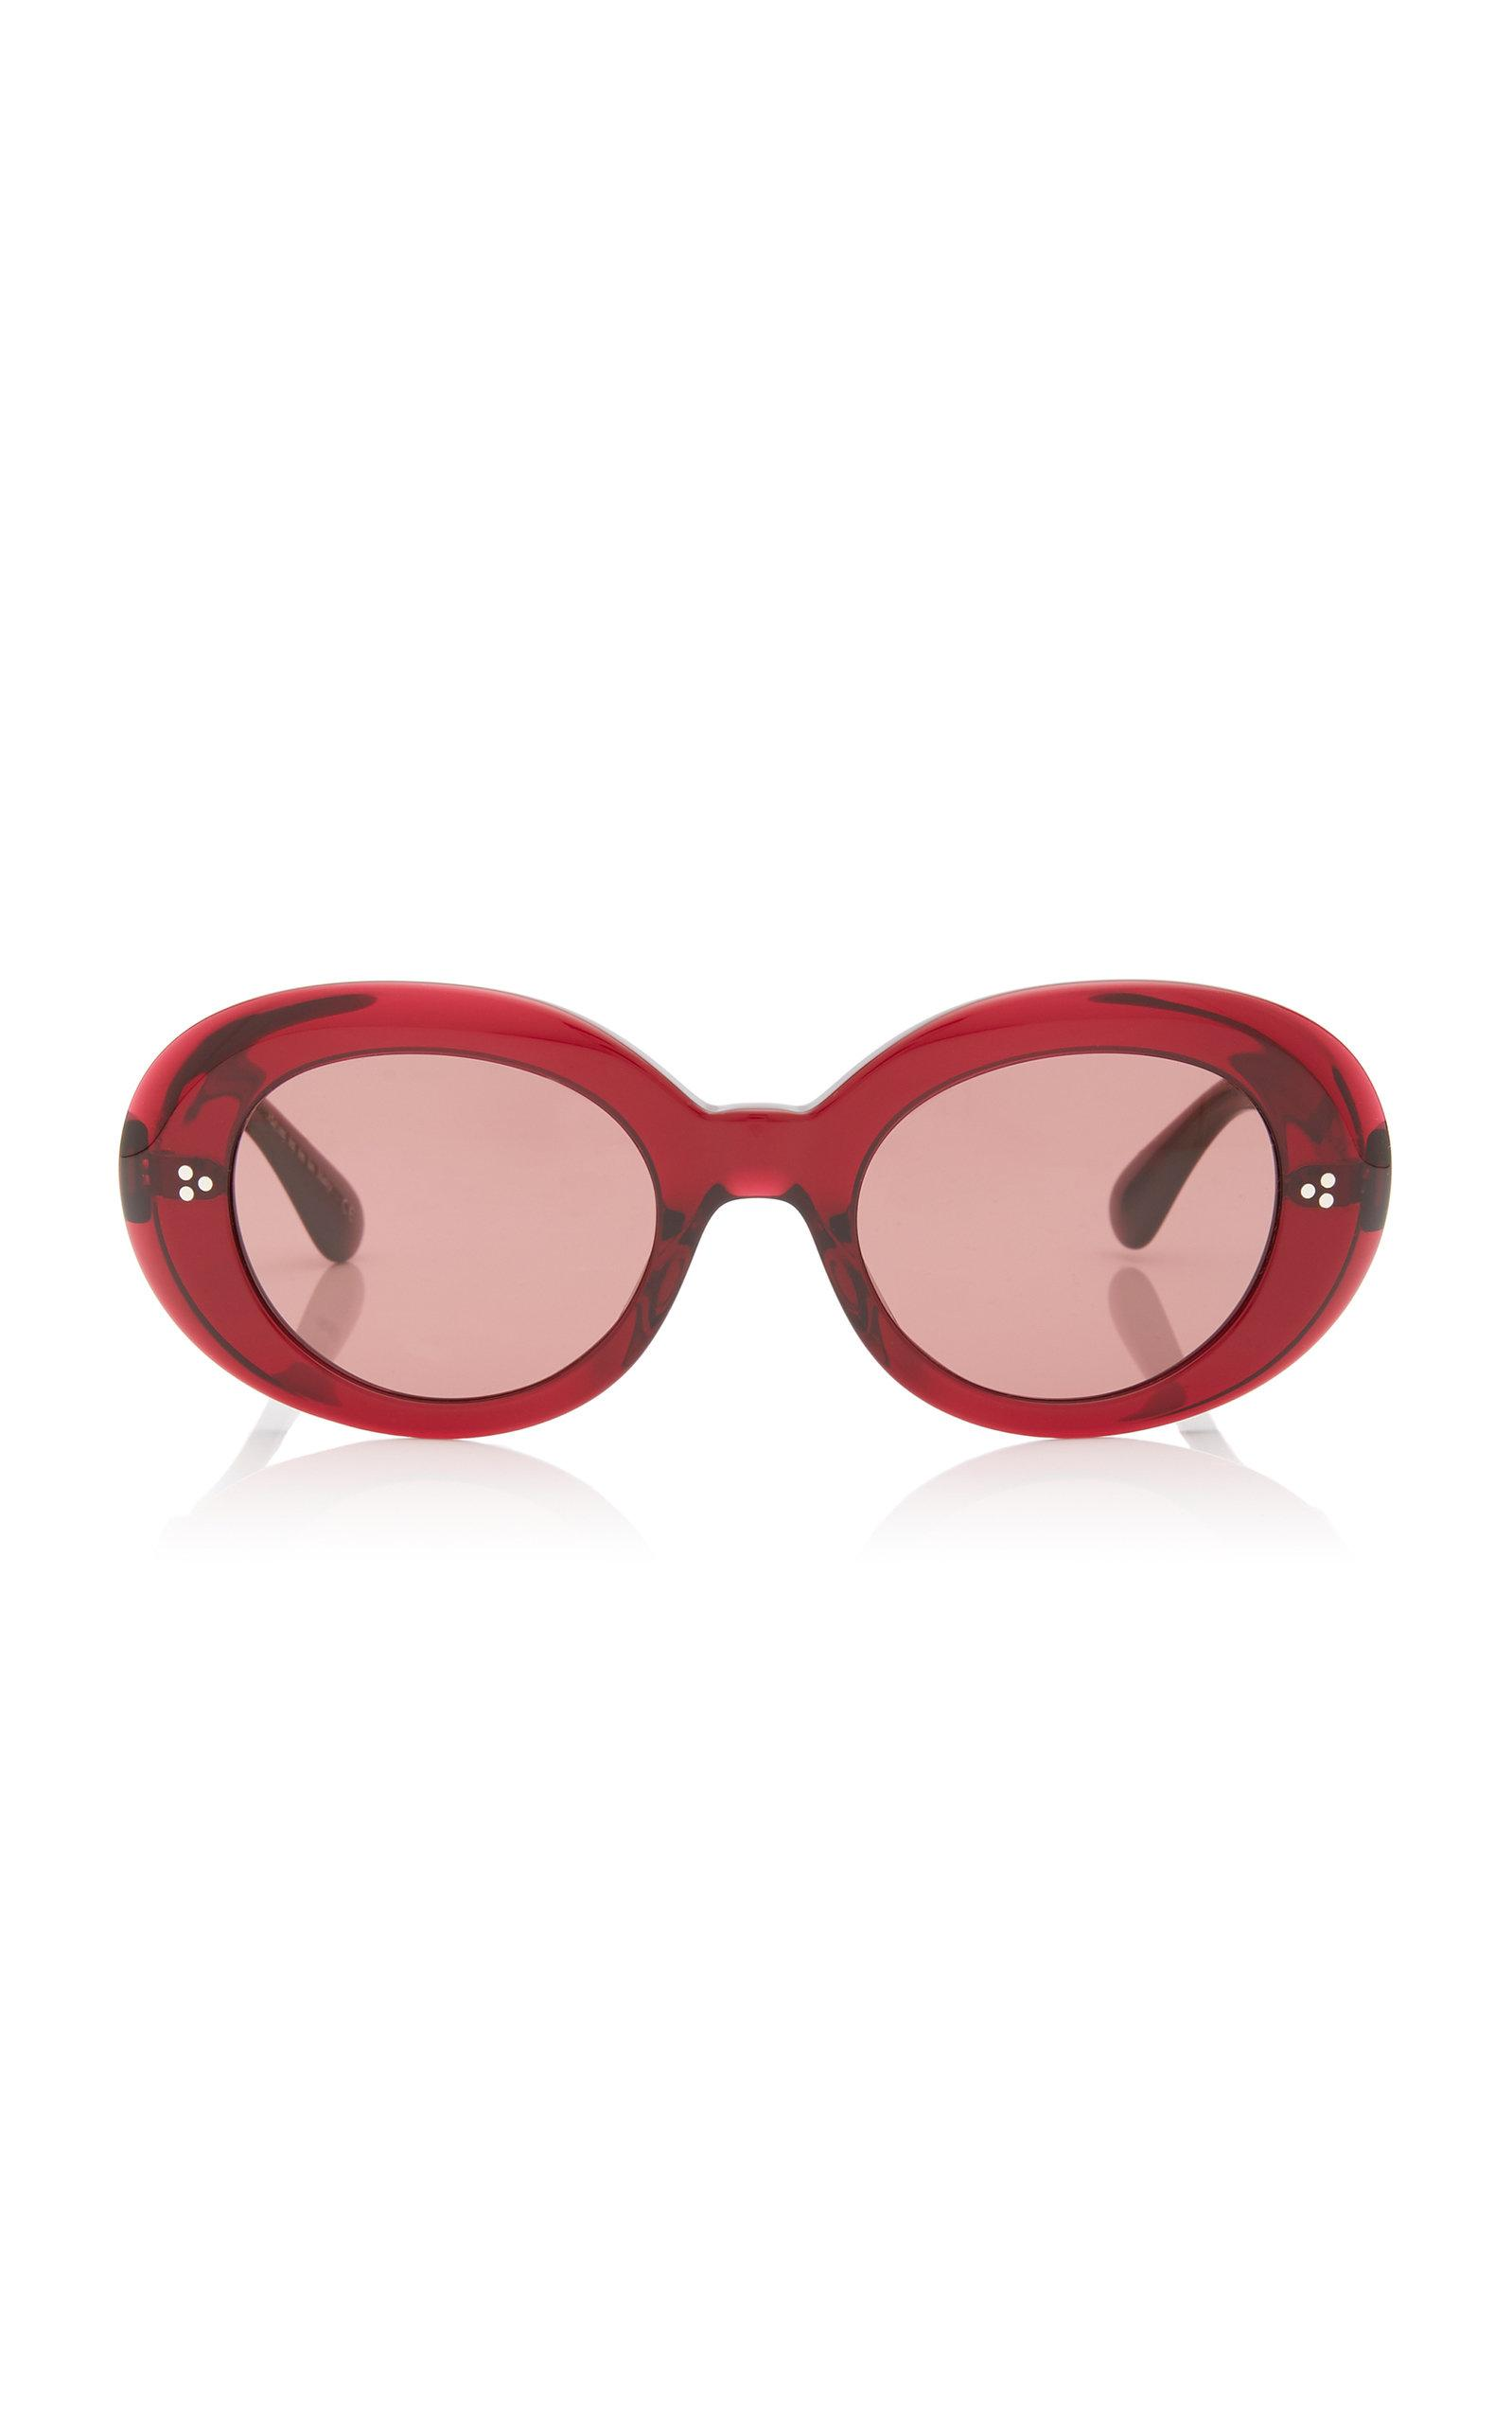 4e4c9d33021 Oliver Peoples. Women s Erissa Round-frame Acetate Sunglasses.  380 From Moda  Operandi